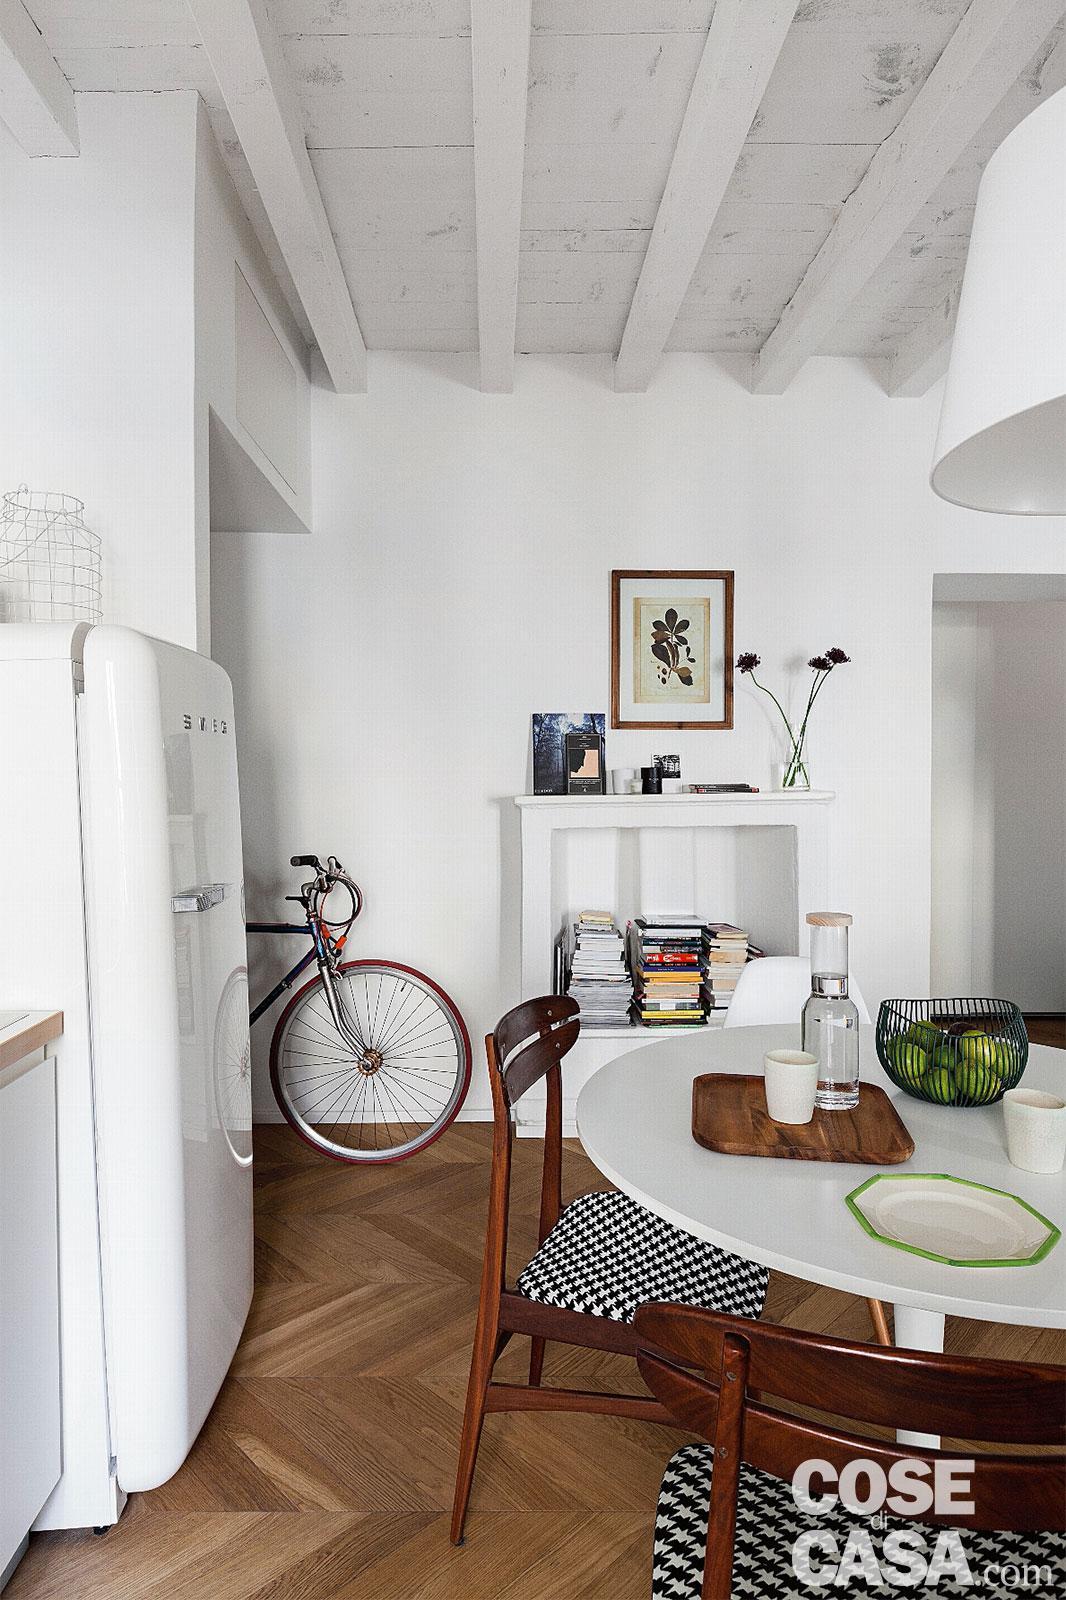 Soffitto Travi A Vista Bianco mini bilocale di 45 mq con travi a vista in bianco - cose di